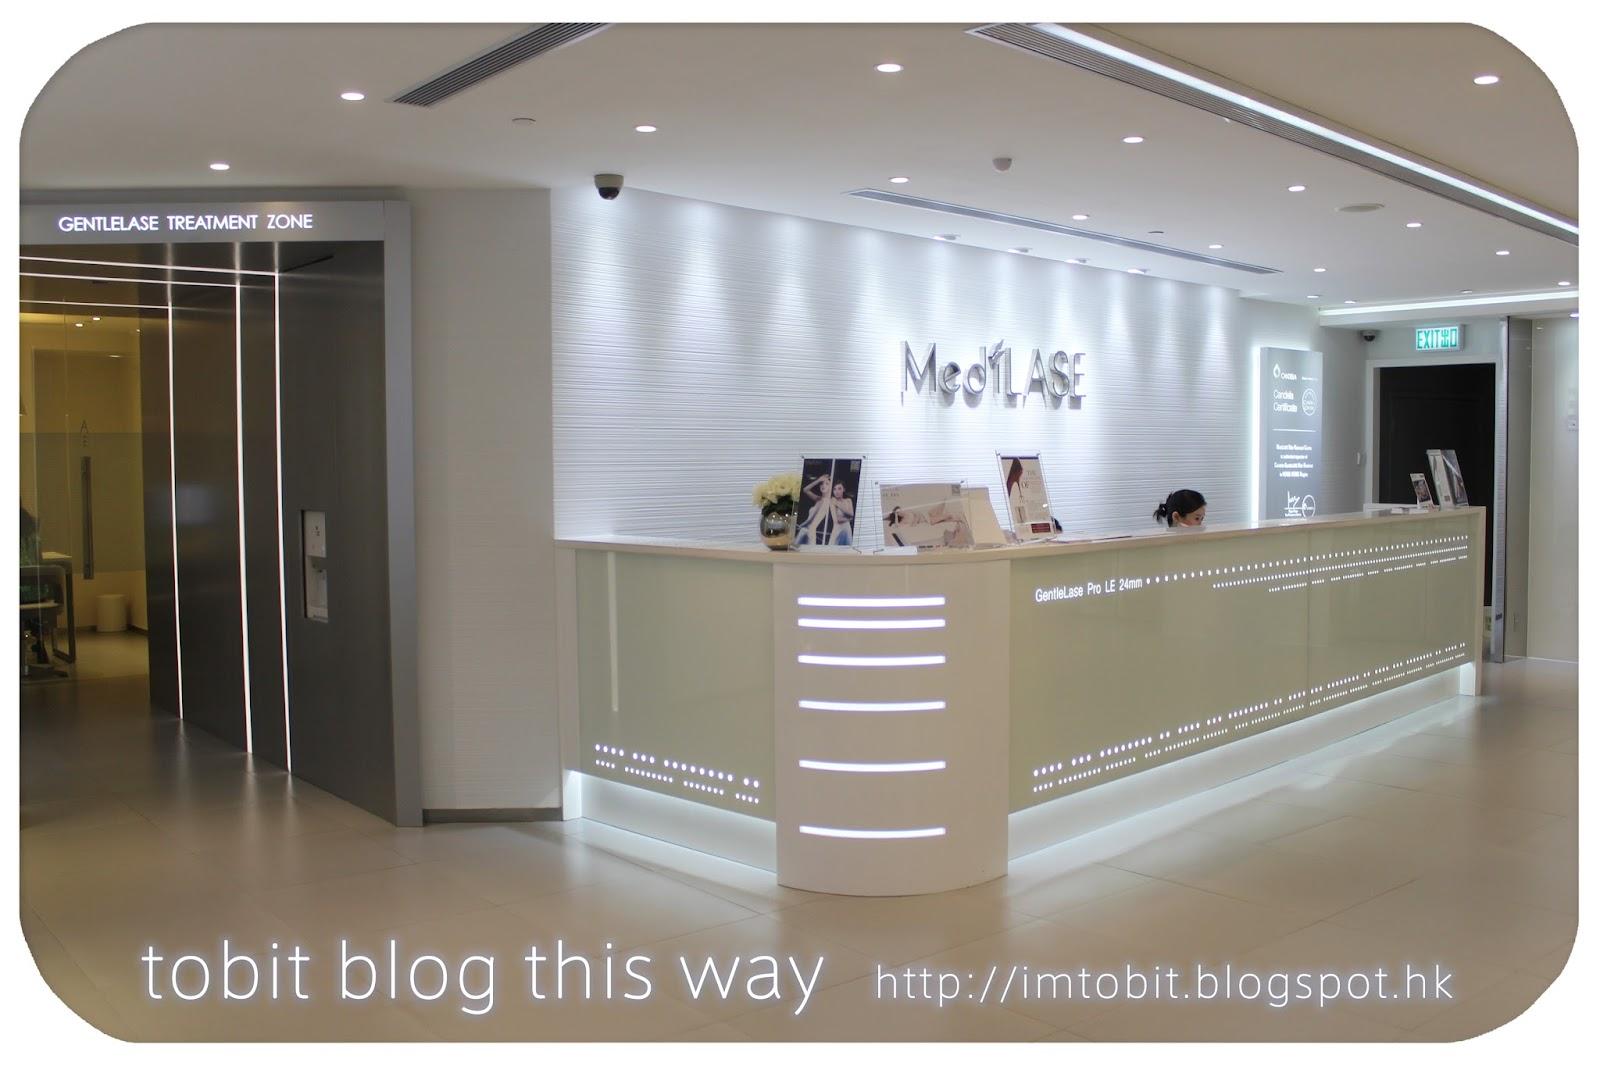 http://1.bp.blogspot.com/-nOe9JW6ZwqM/U9ydioOe1EI/AAAAAAAAZN0/r0_u7_Xwmvw/s1600/medilasecwb_lobby3.jpg